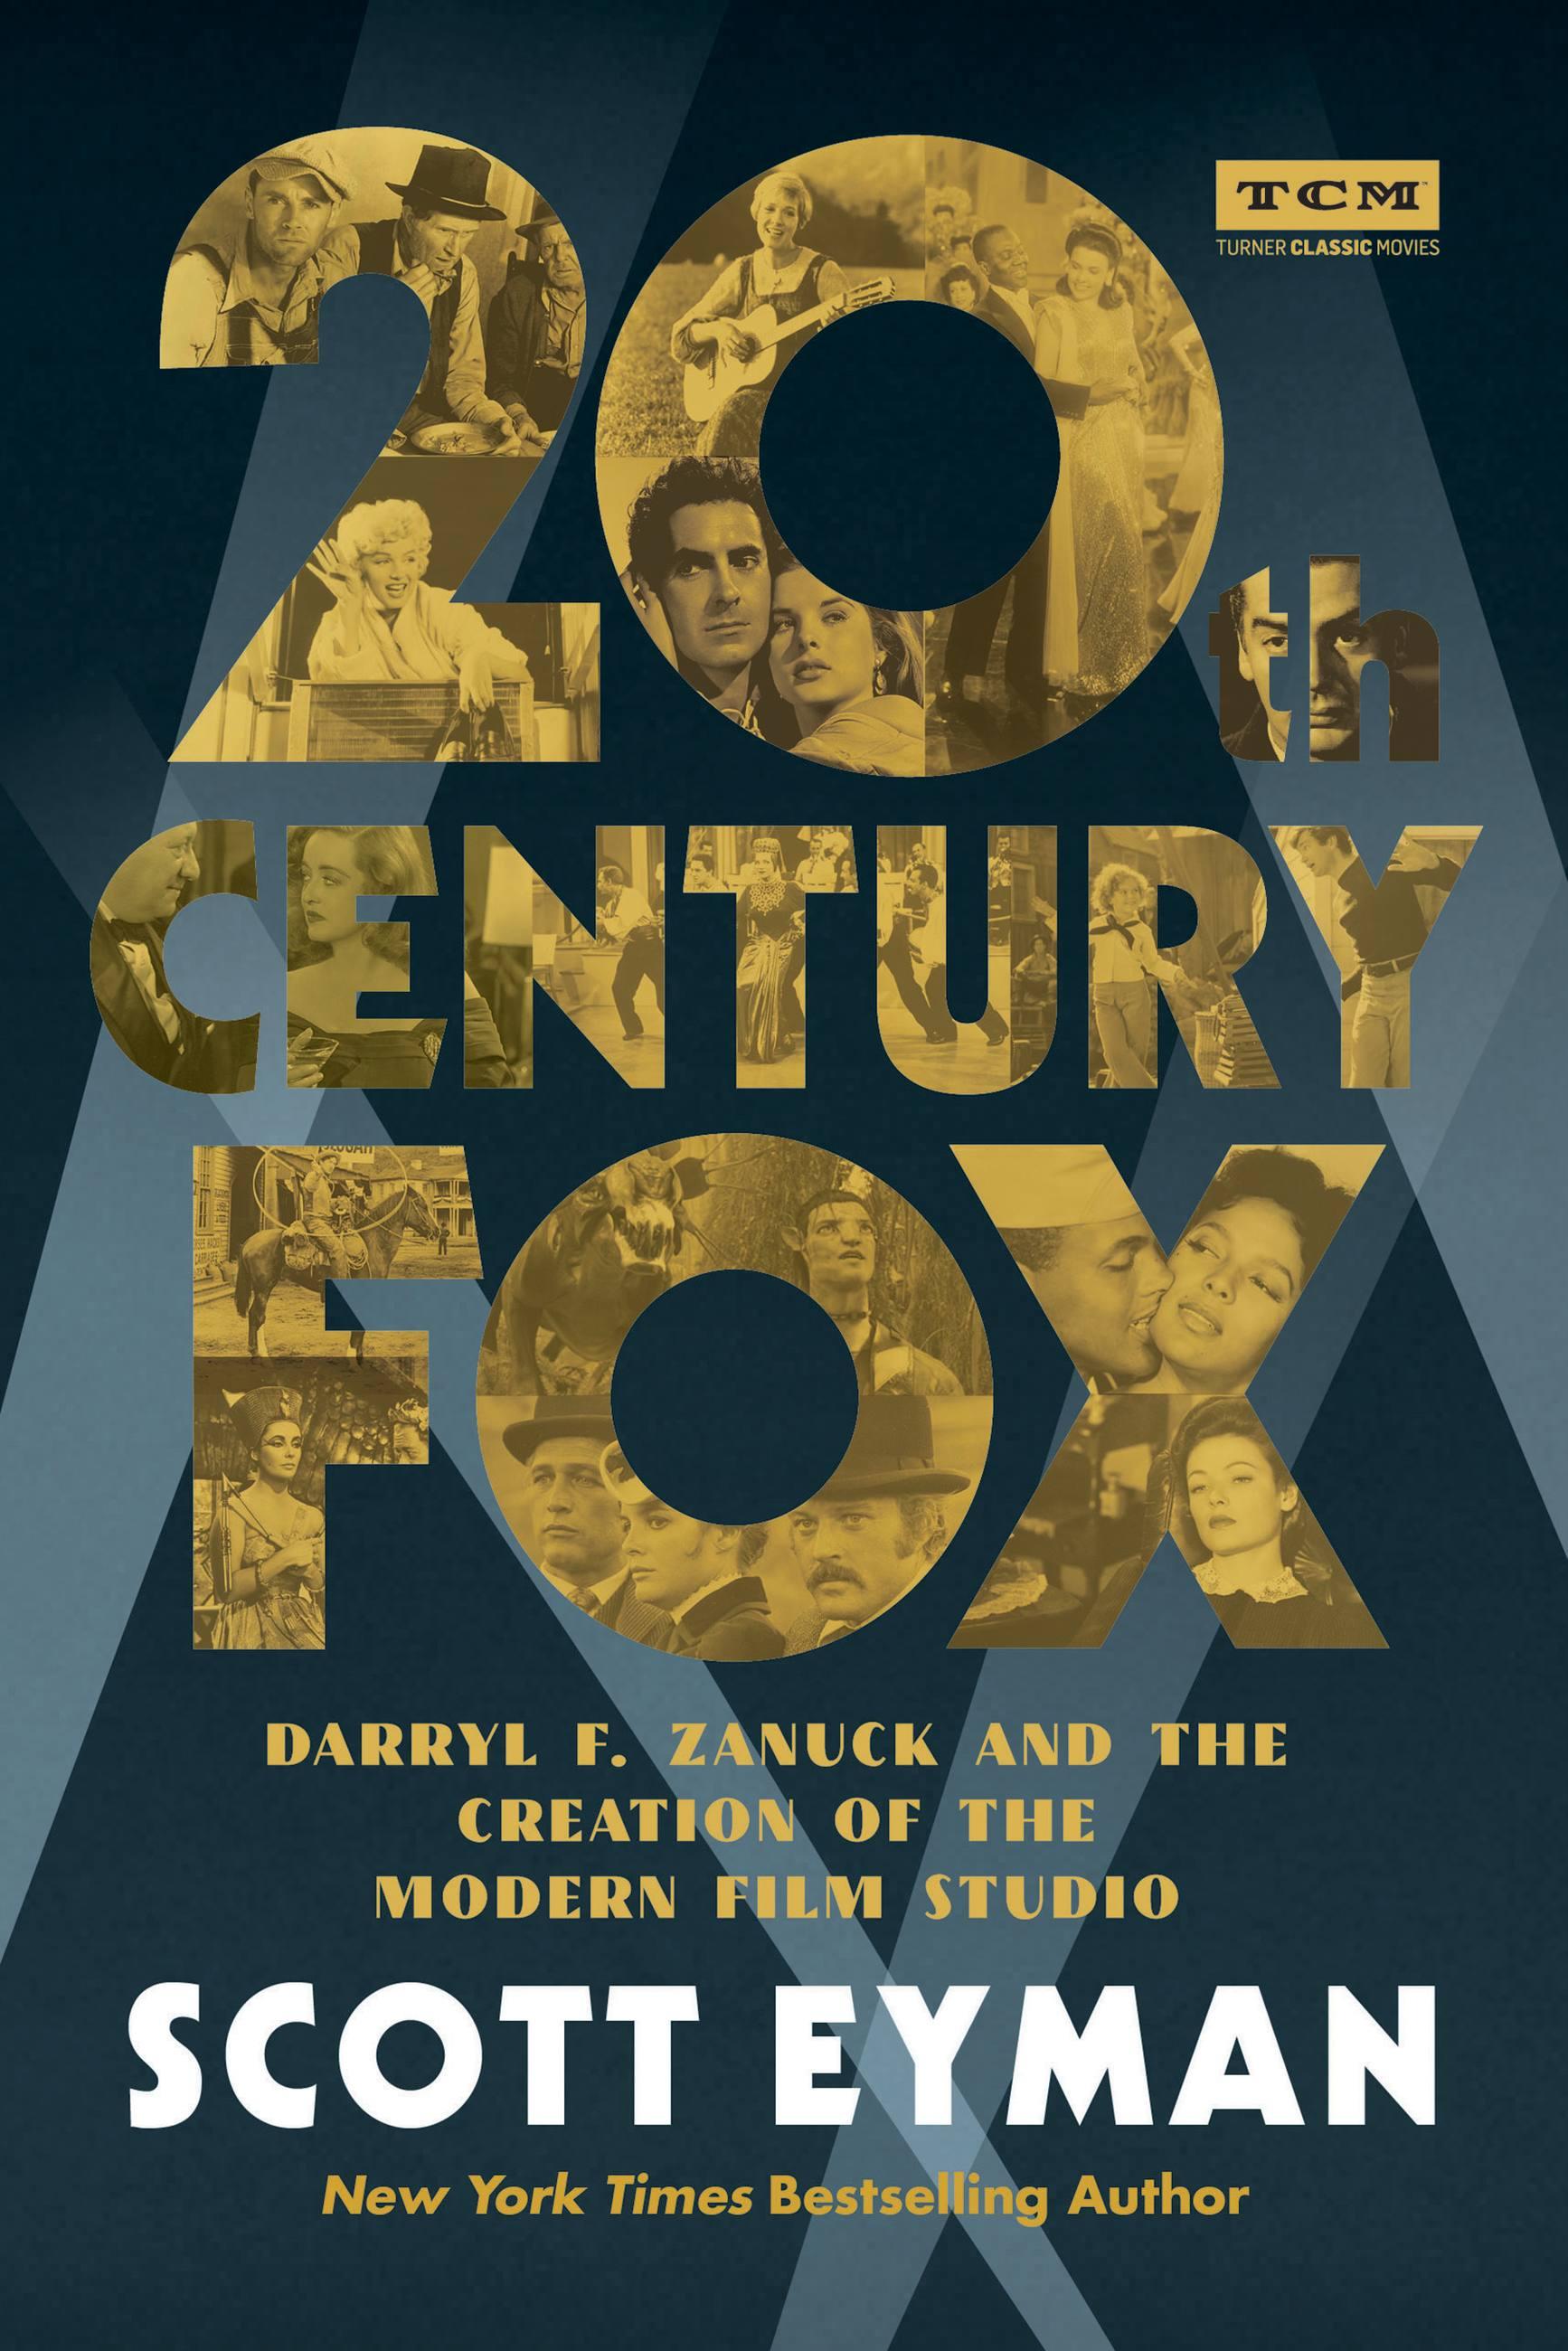 20th Century-Fox Darryl F. Zanuck and the Creation of the Modern Film Studio